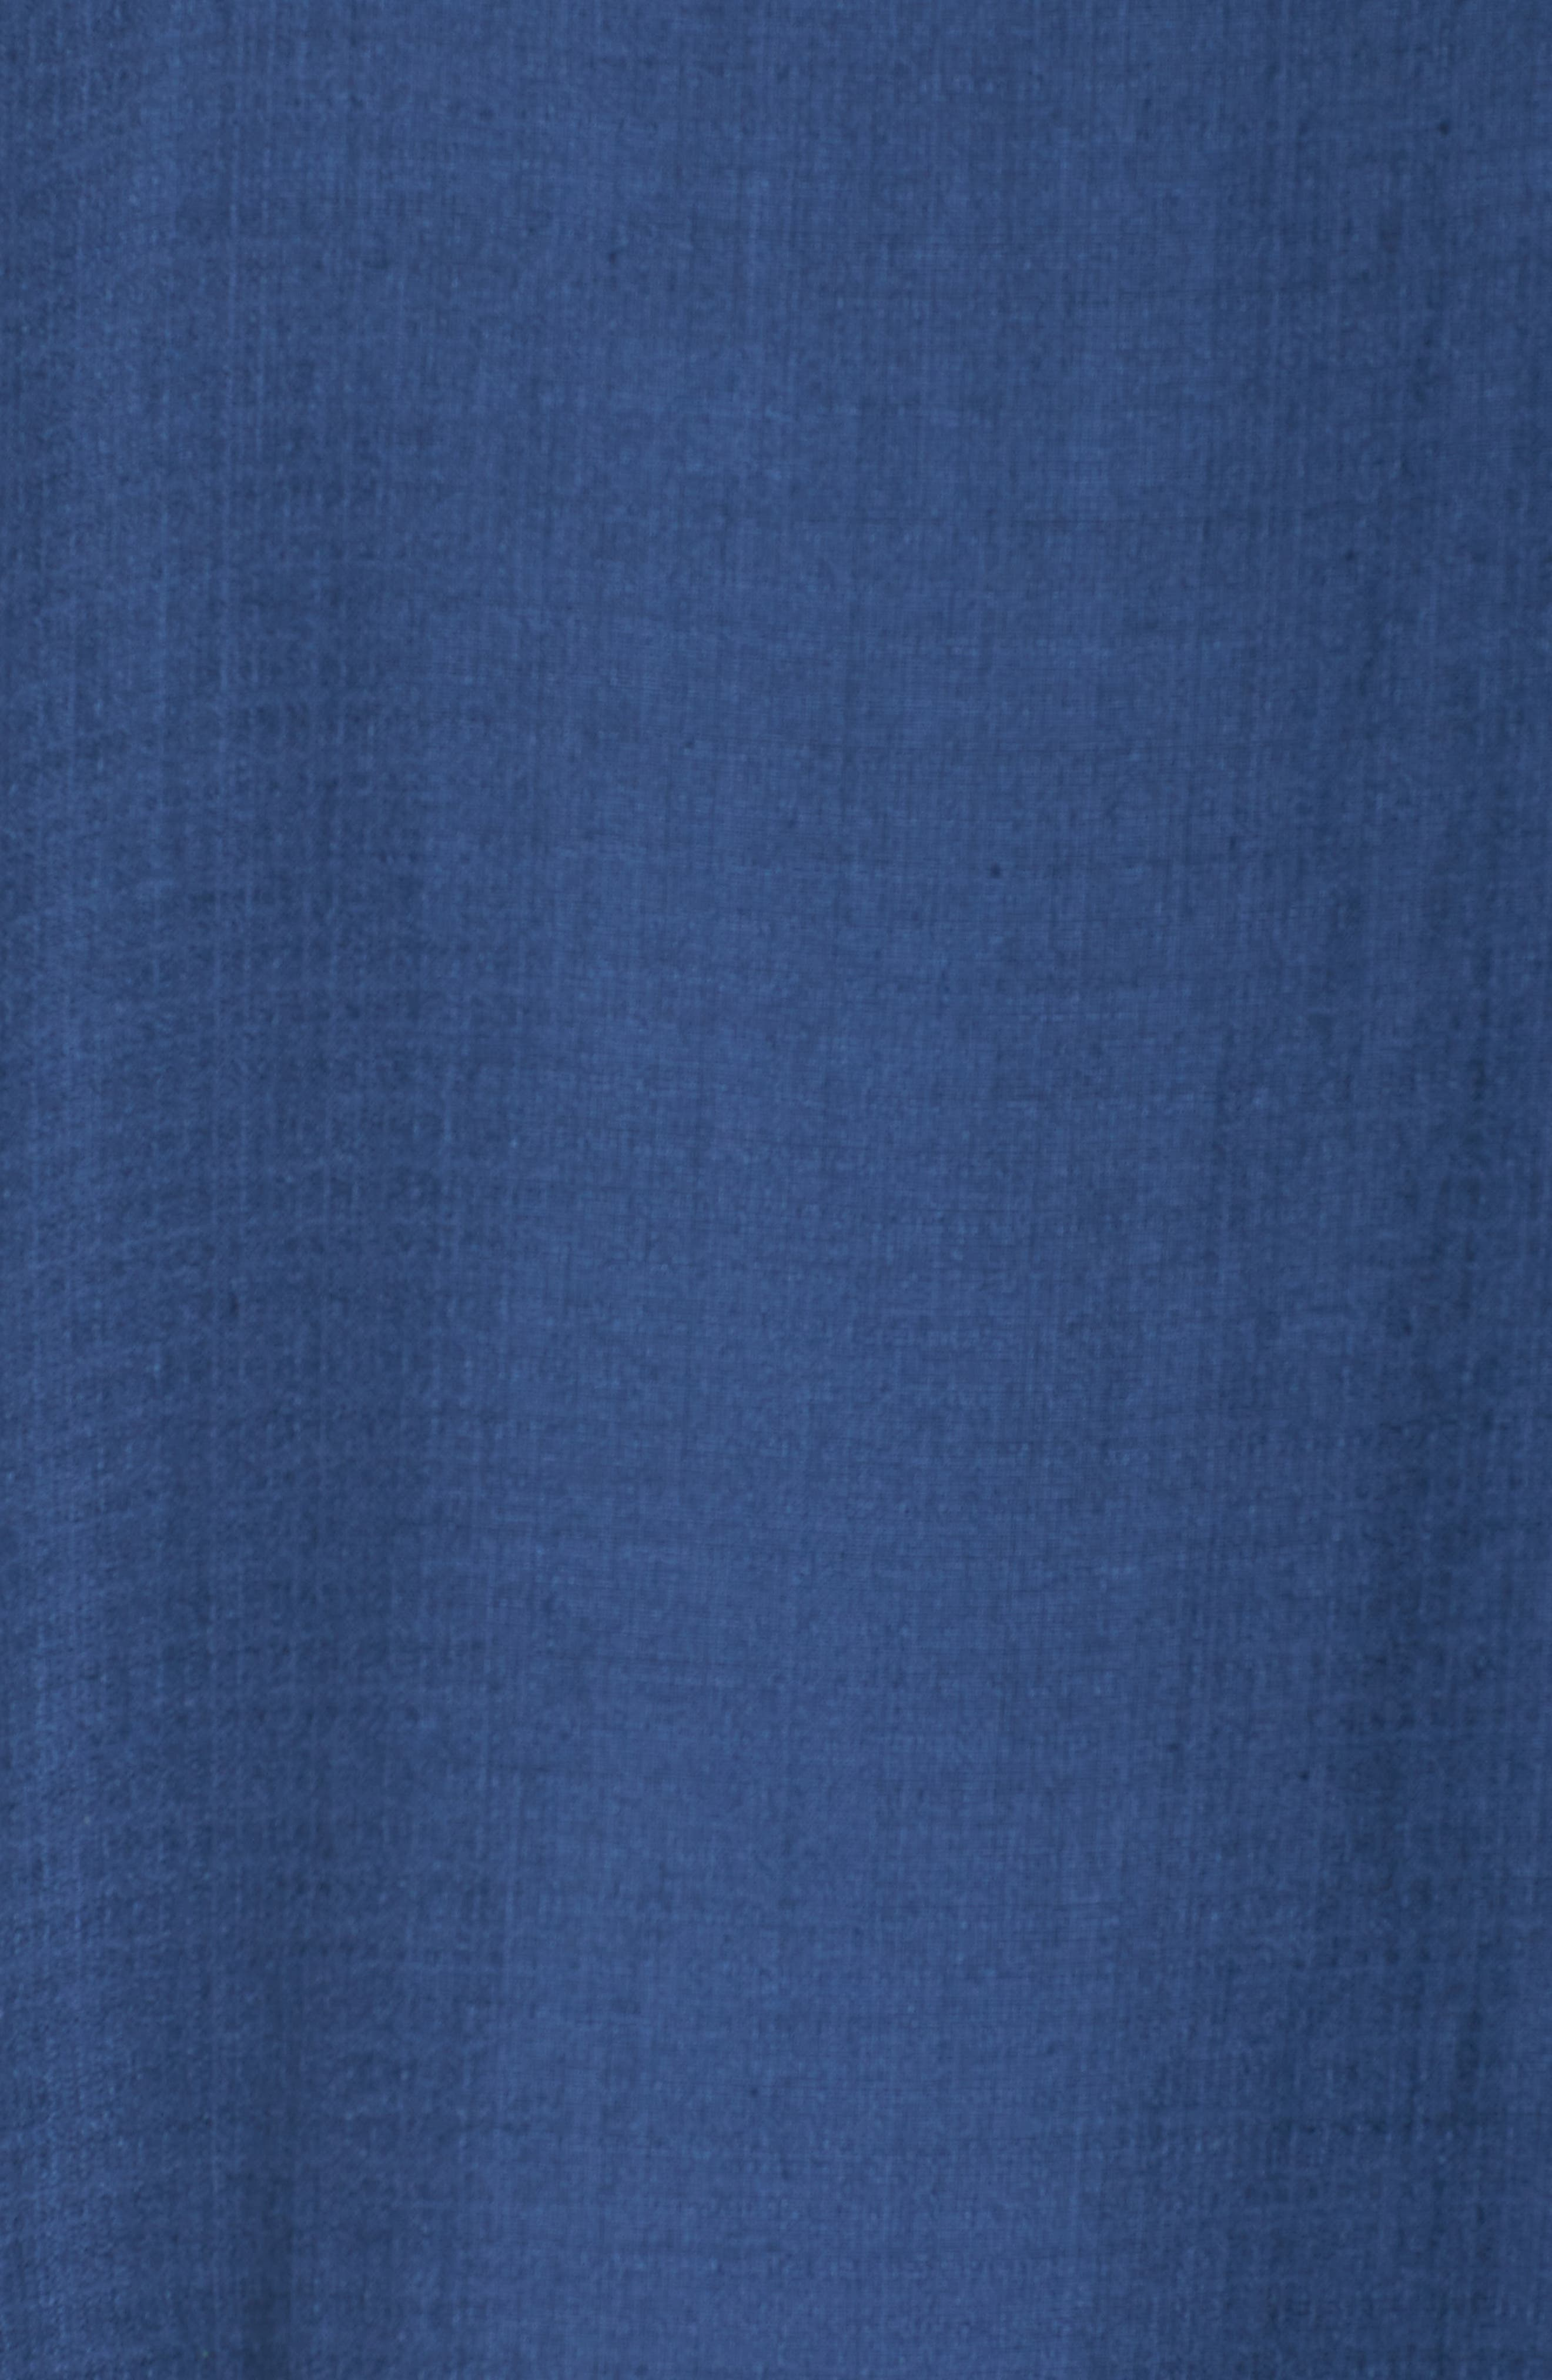 Linen Blend Shift Dress,                             Alternate thumbnail 15, color,